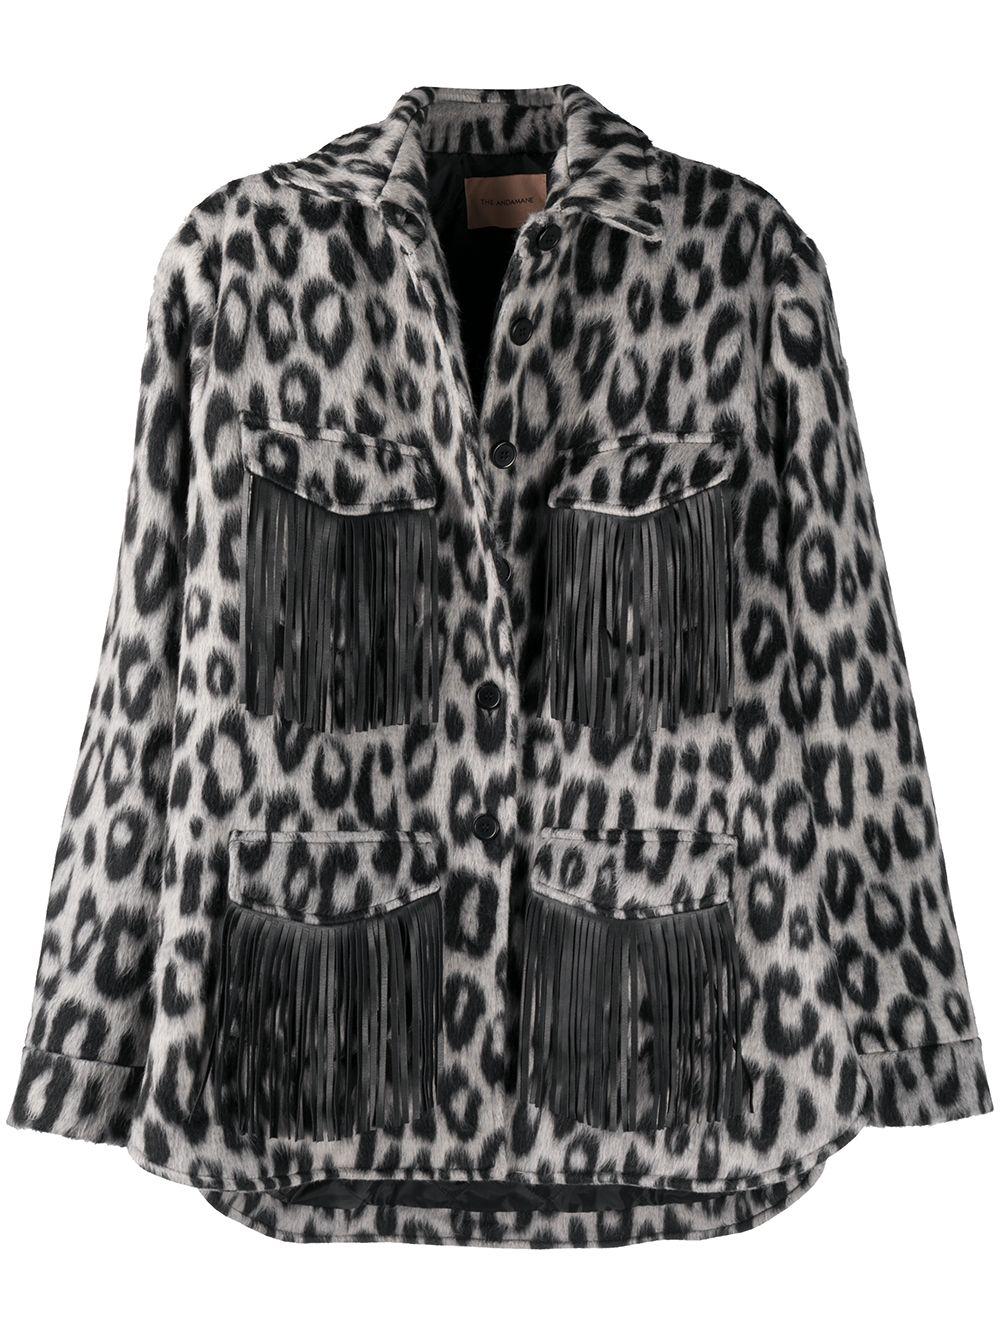 Evita Wool Jacket